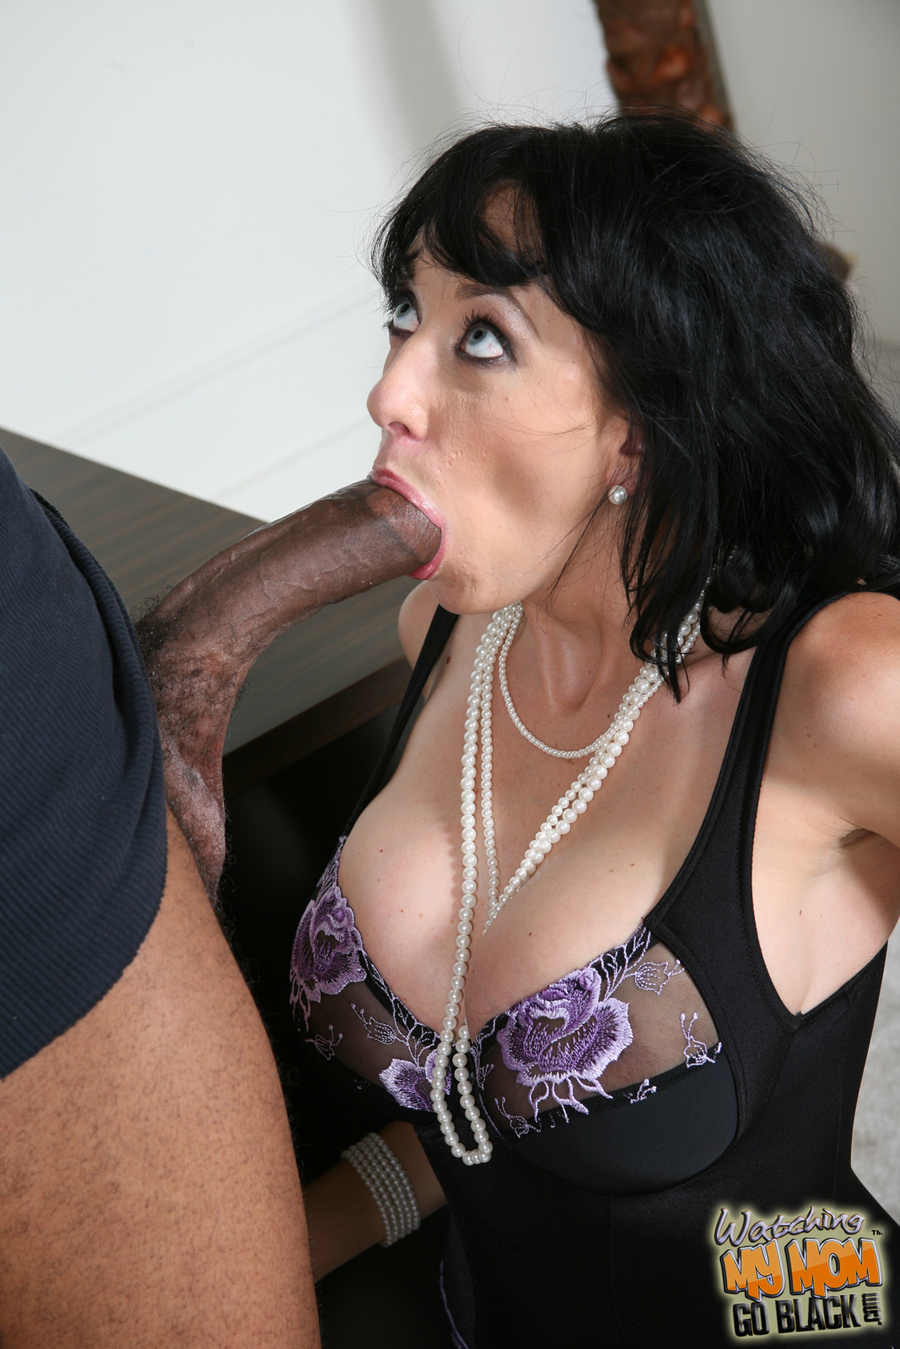 Dark meat asian treat 1 scene 5 keeani lei 6